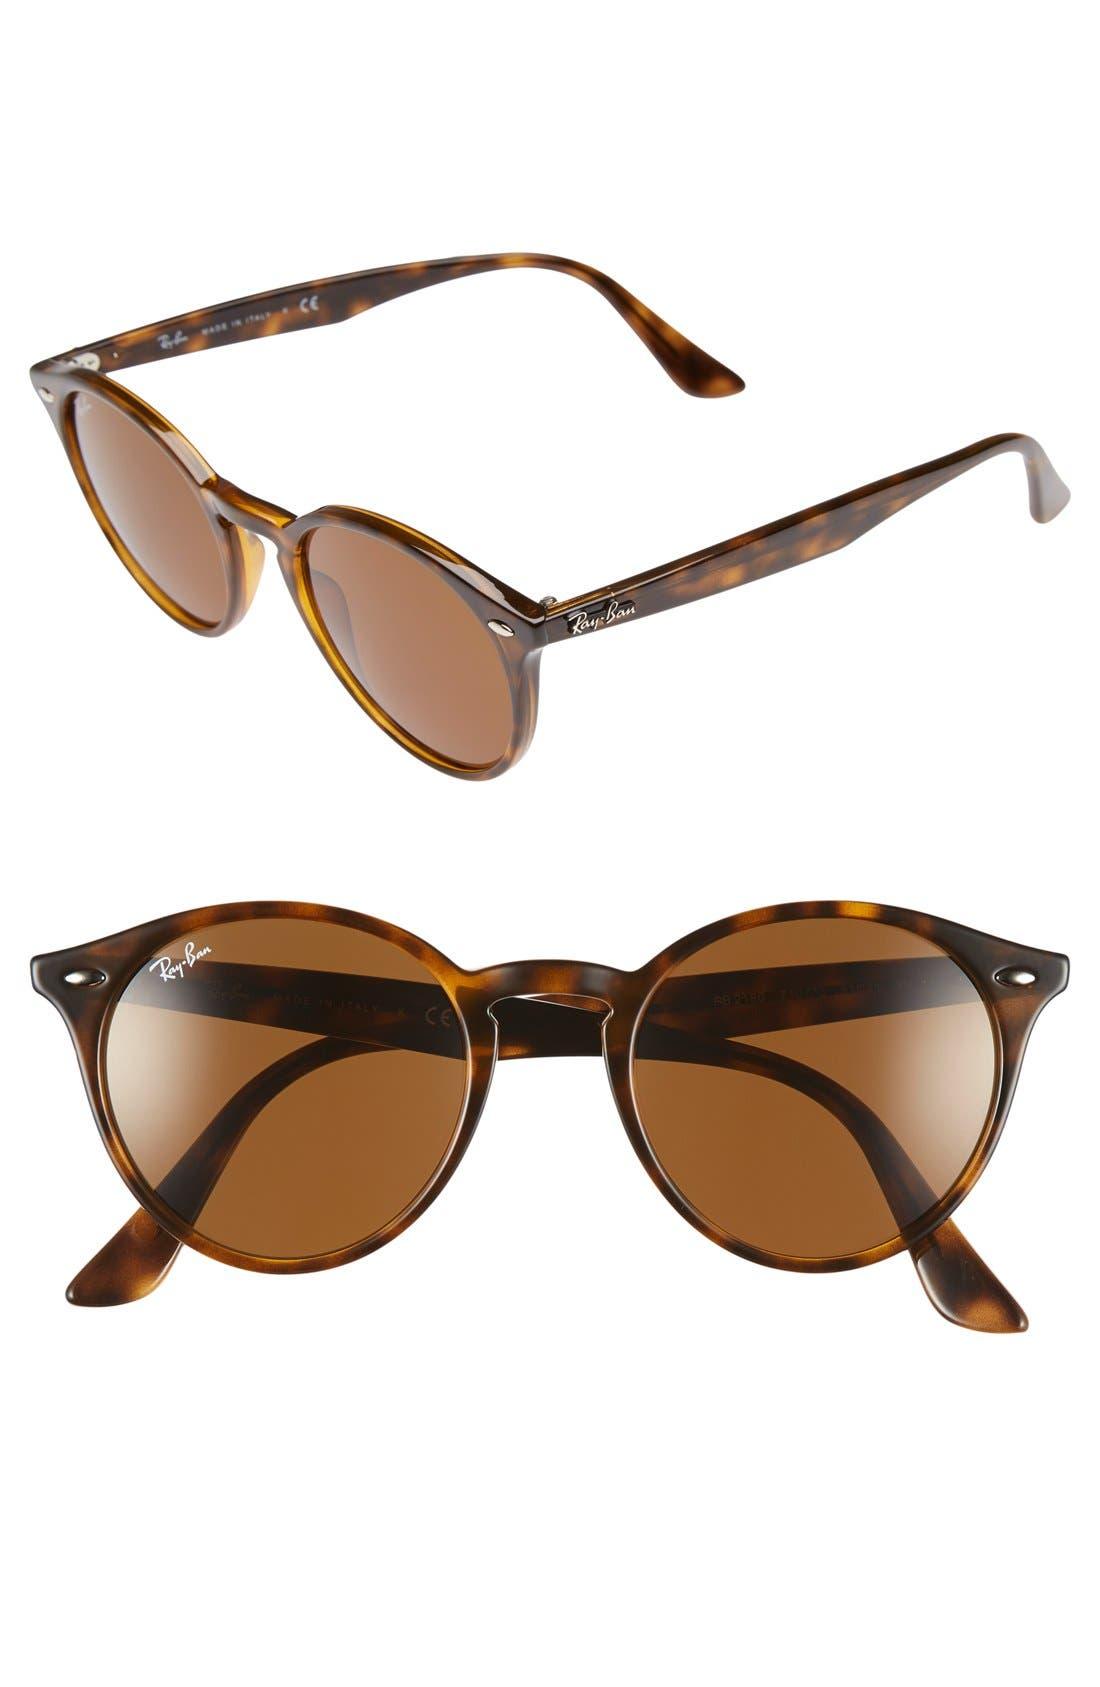 Highstreet 51mm Round Sunglasses,                             Main thumbnail 1, color,                             Dark Havana